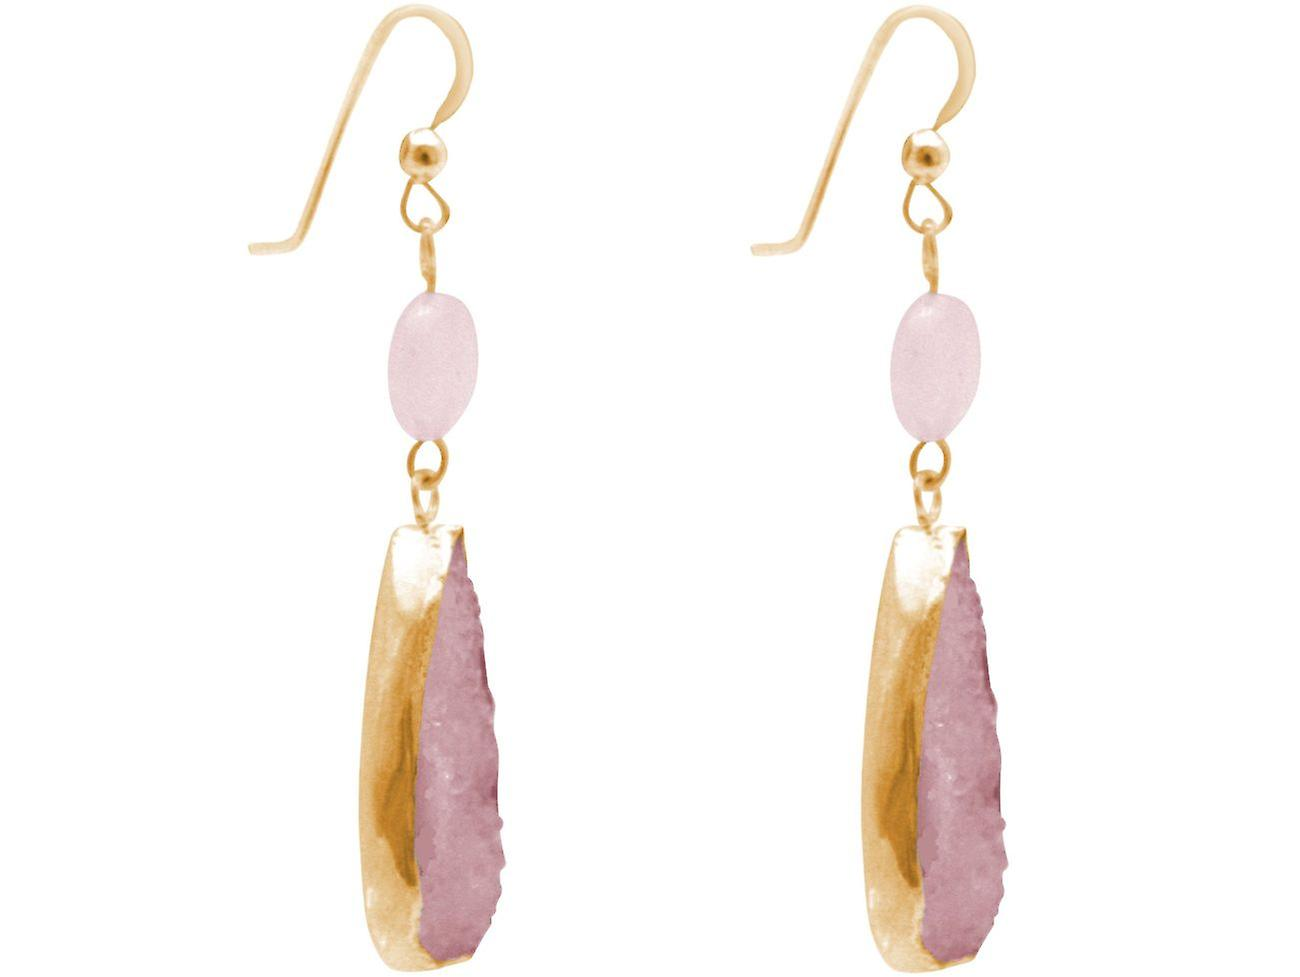 Gemshine Ohrringe Rosenquarz Edelstein Tropfen in 925 Silber oder vergoldet